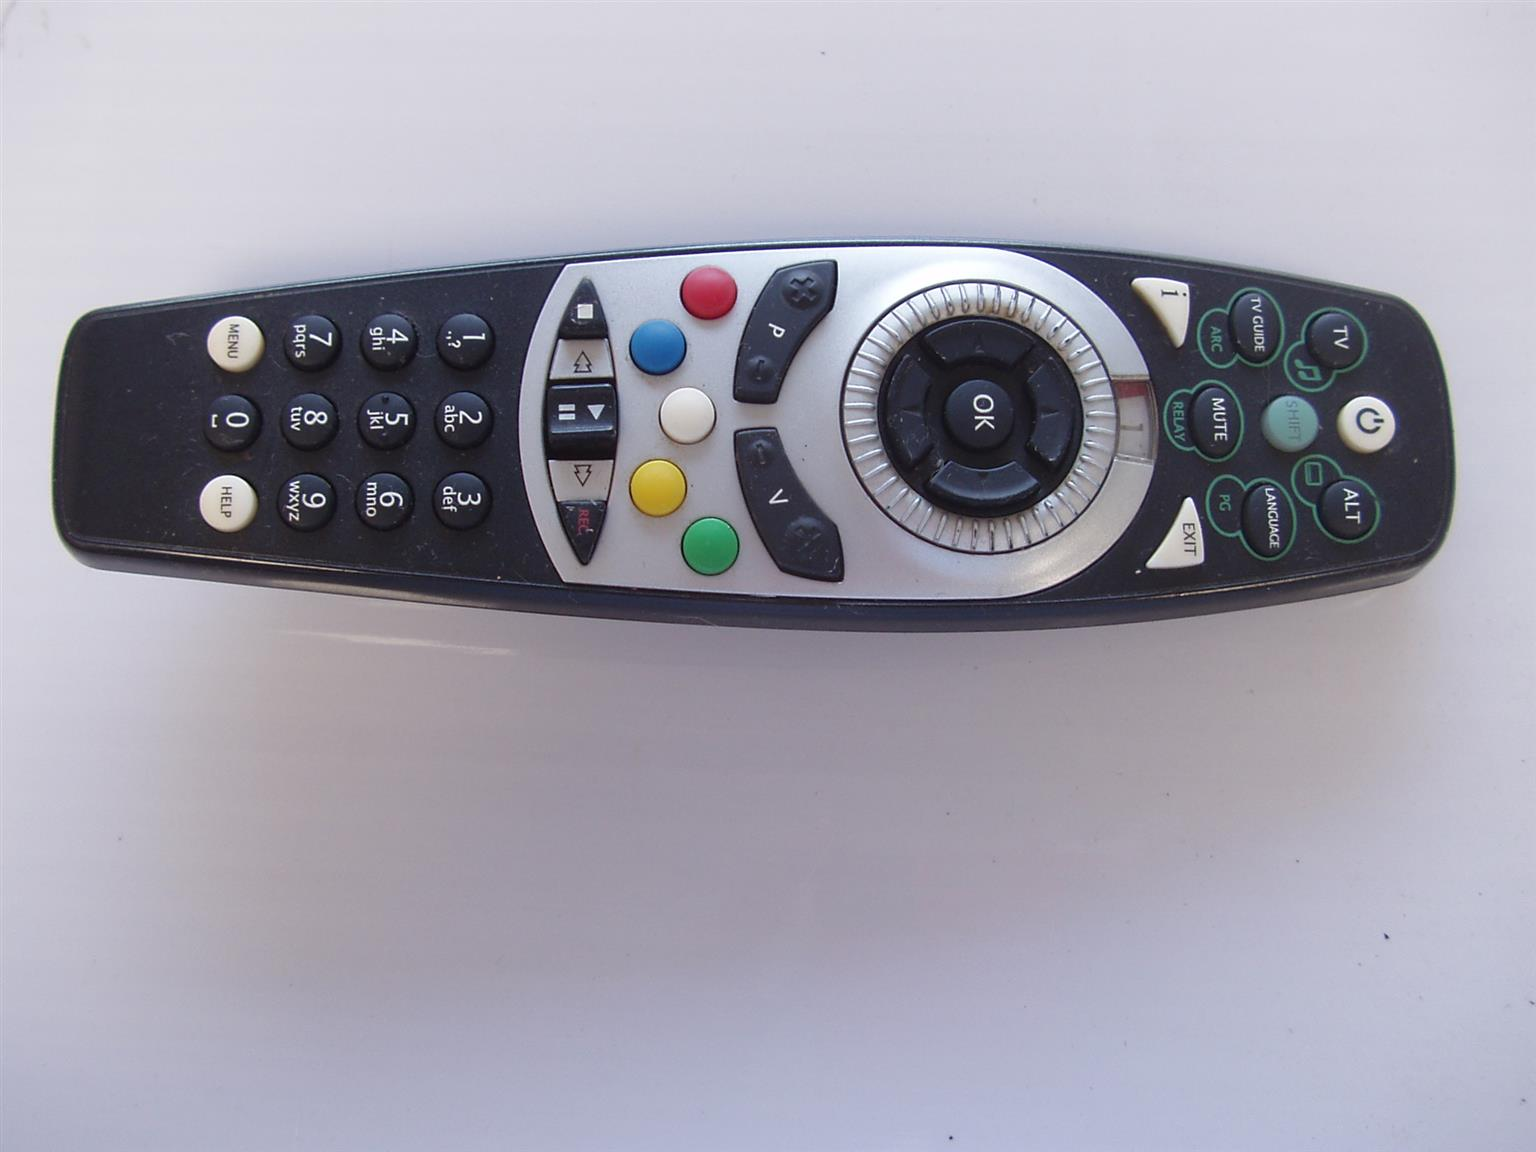 DSTV Remote